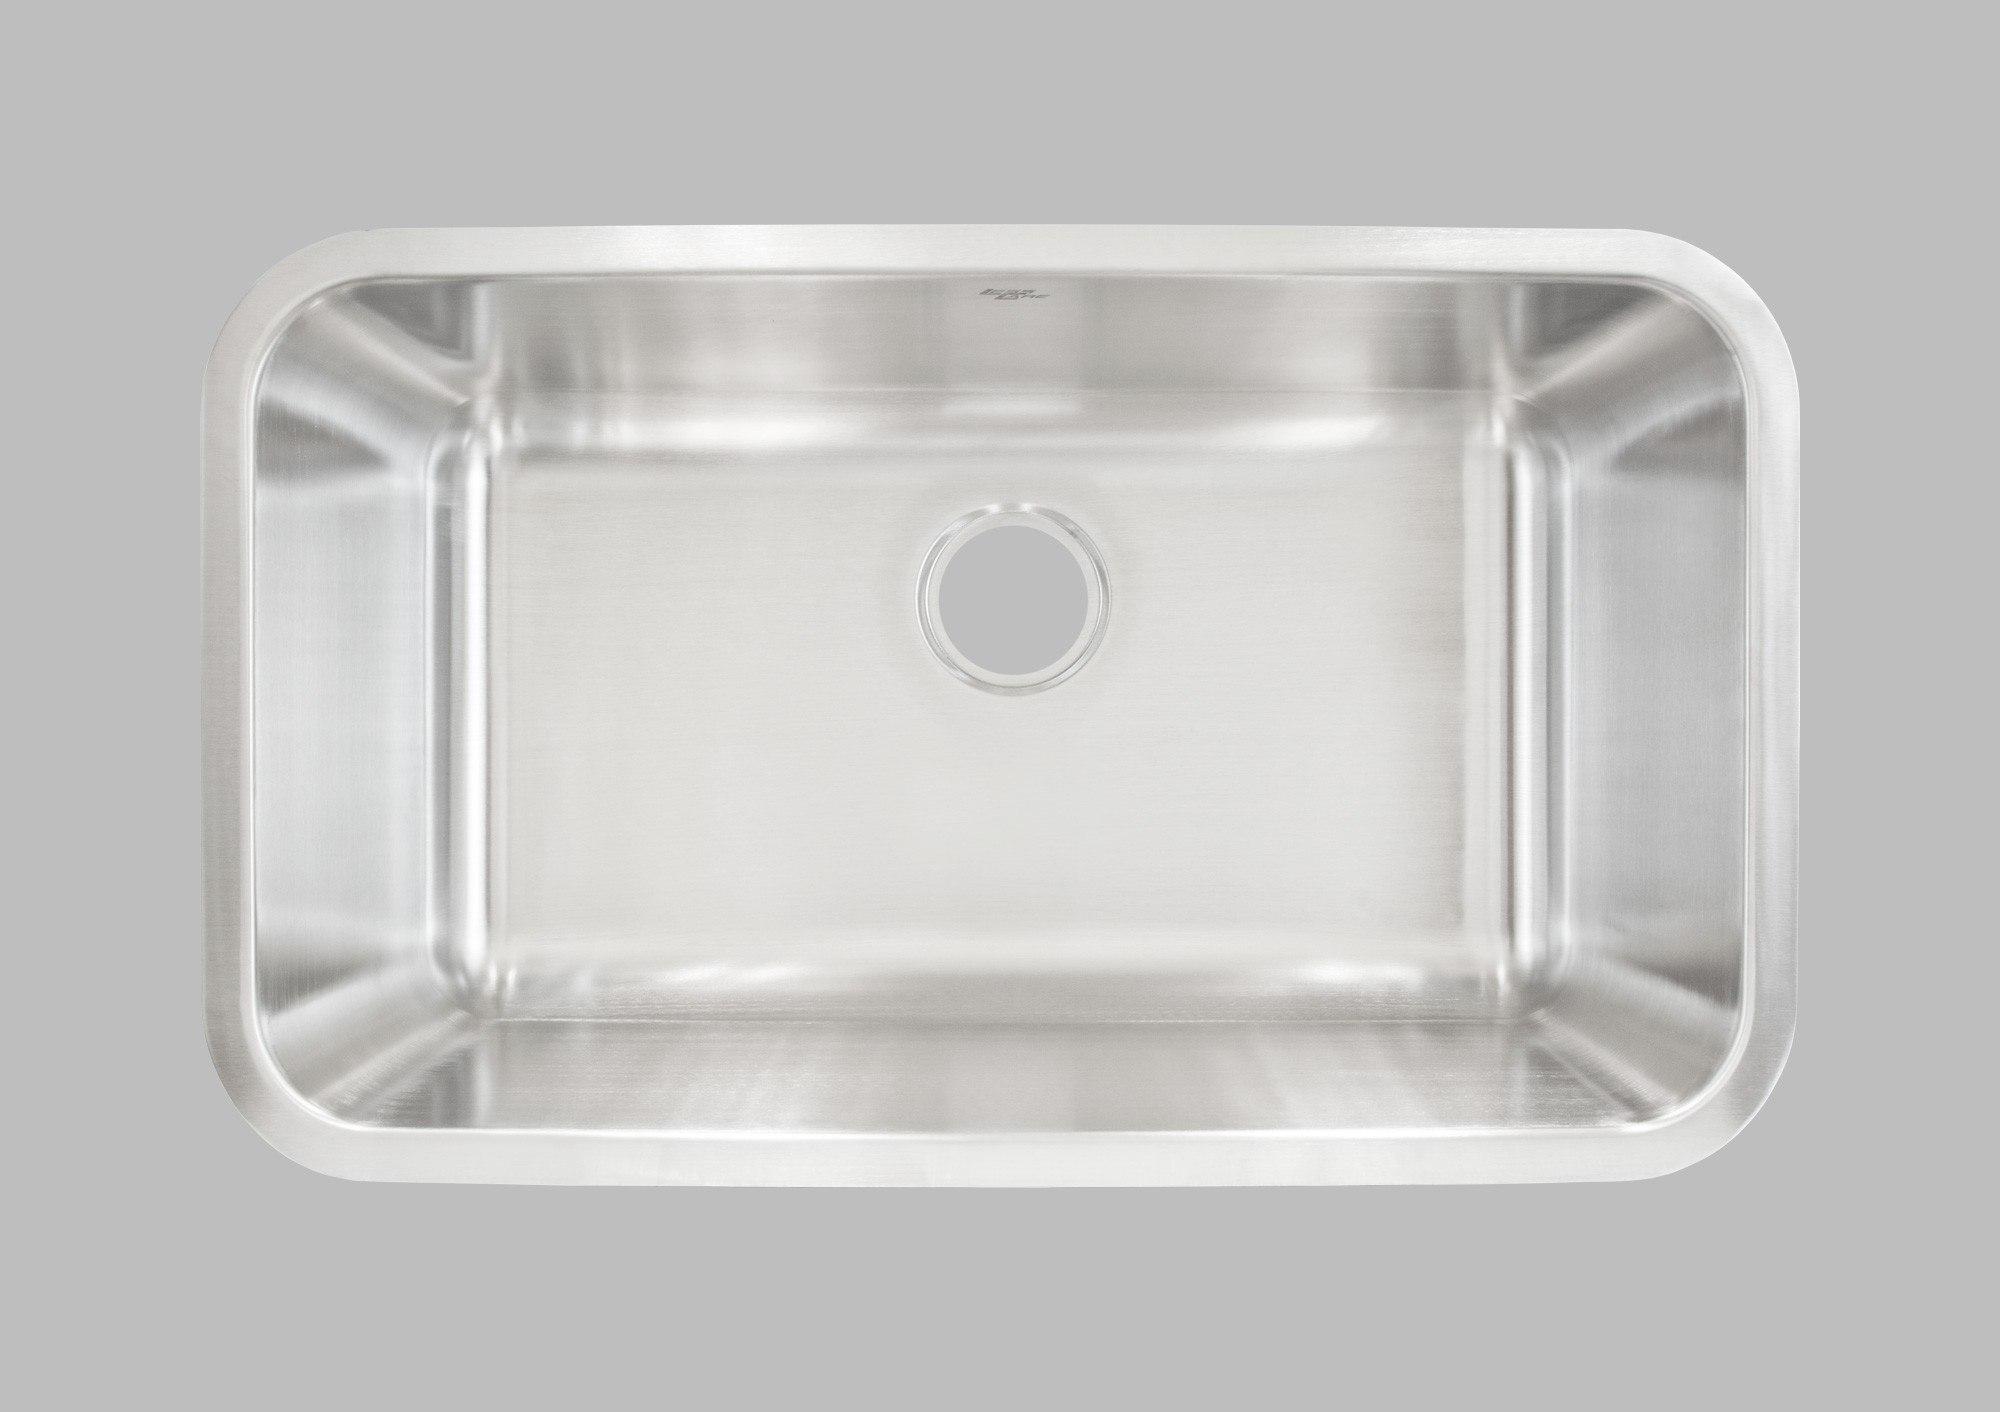 Less Care L107 30 Inch Undermount Single Bowl Kitchen Sink